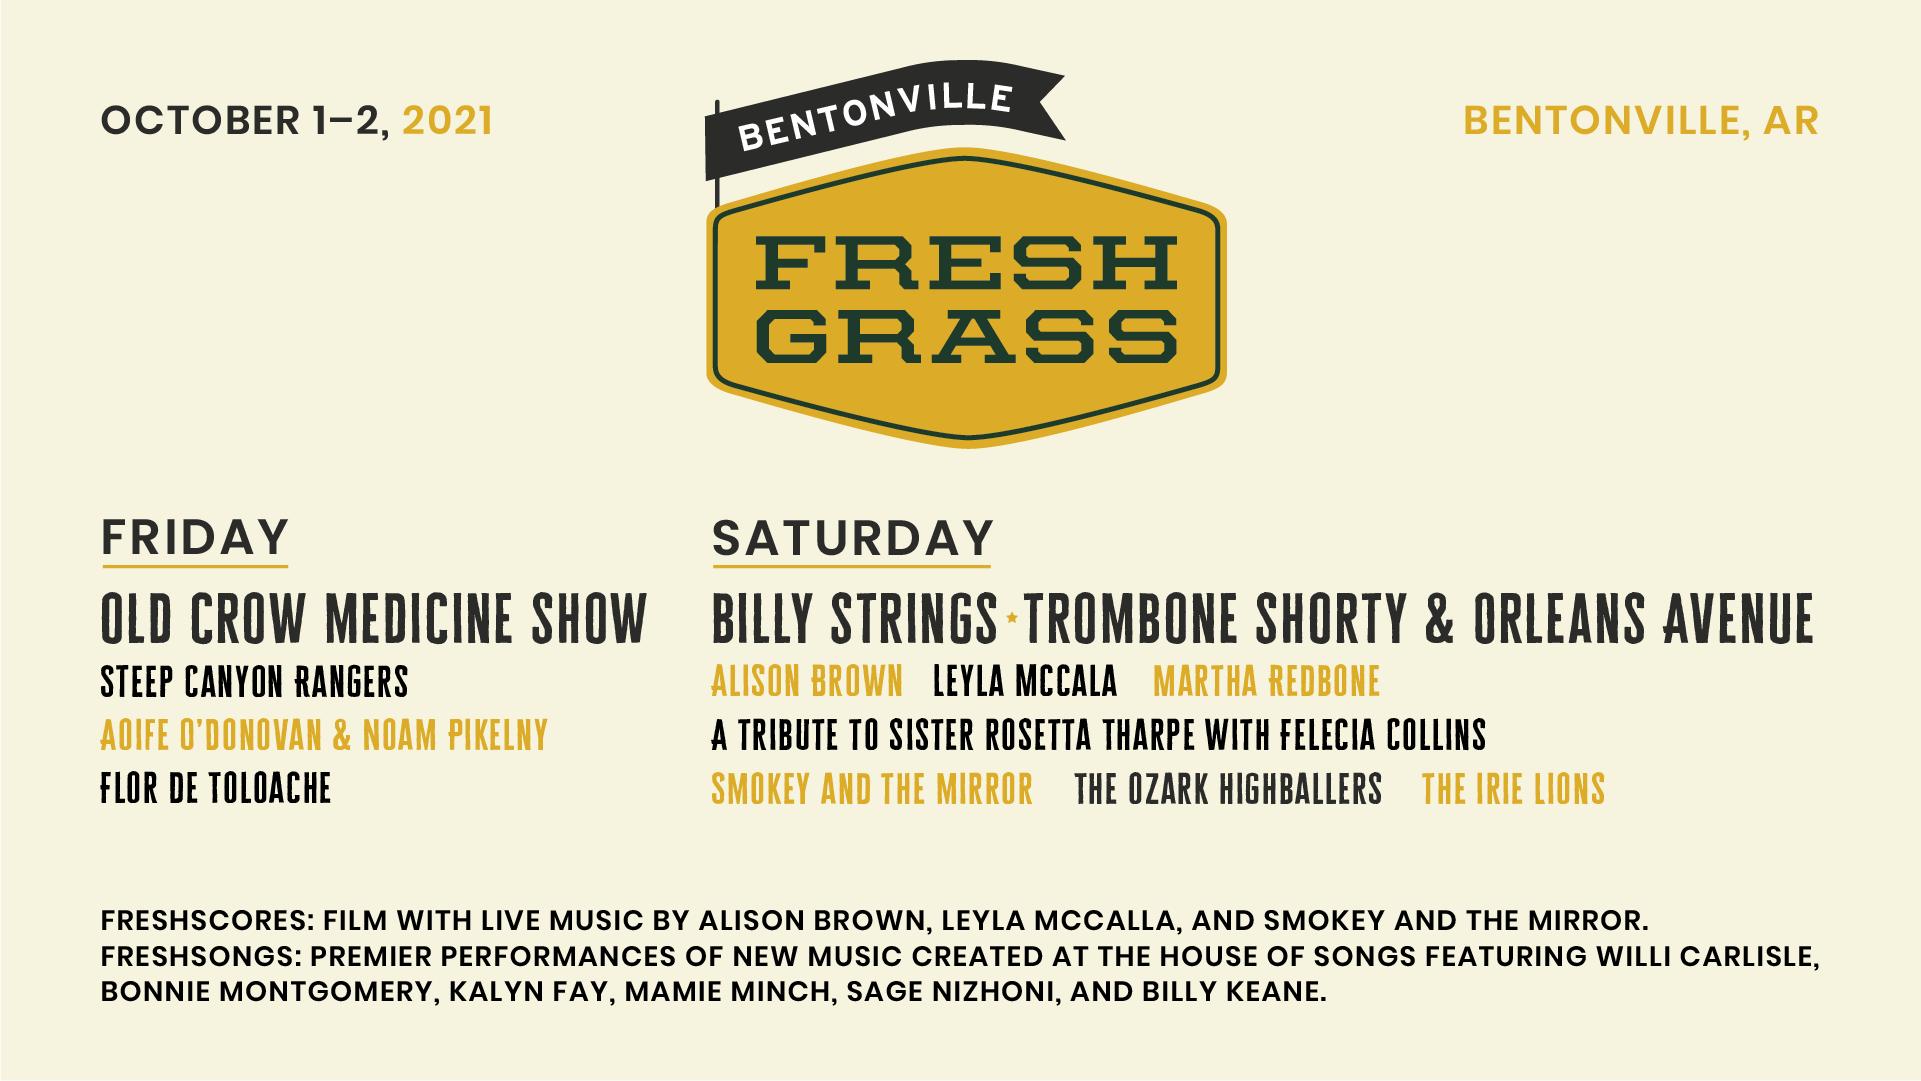 FreshGrass Bentonville 2021 Lineup: Old Crow Medicine Show, Steep Canyon Rangers, Aoife O'Donovan & Noam Pikelny, Flor De Toloache, Billy Strings, Trombone Shorty & Orleans Avenue, Alsi Brown, Leyla McCalla